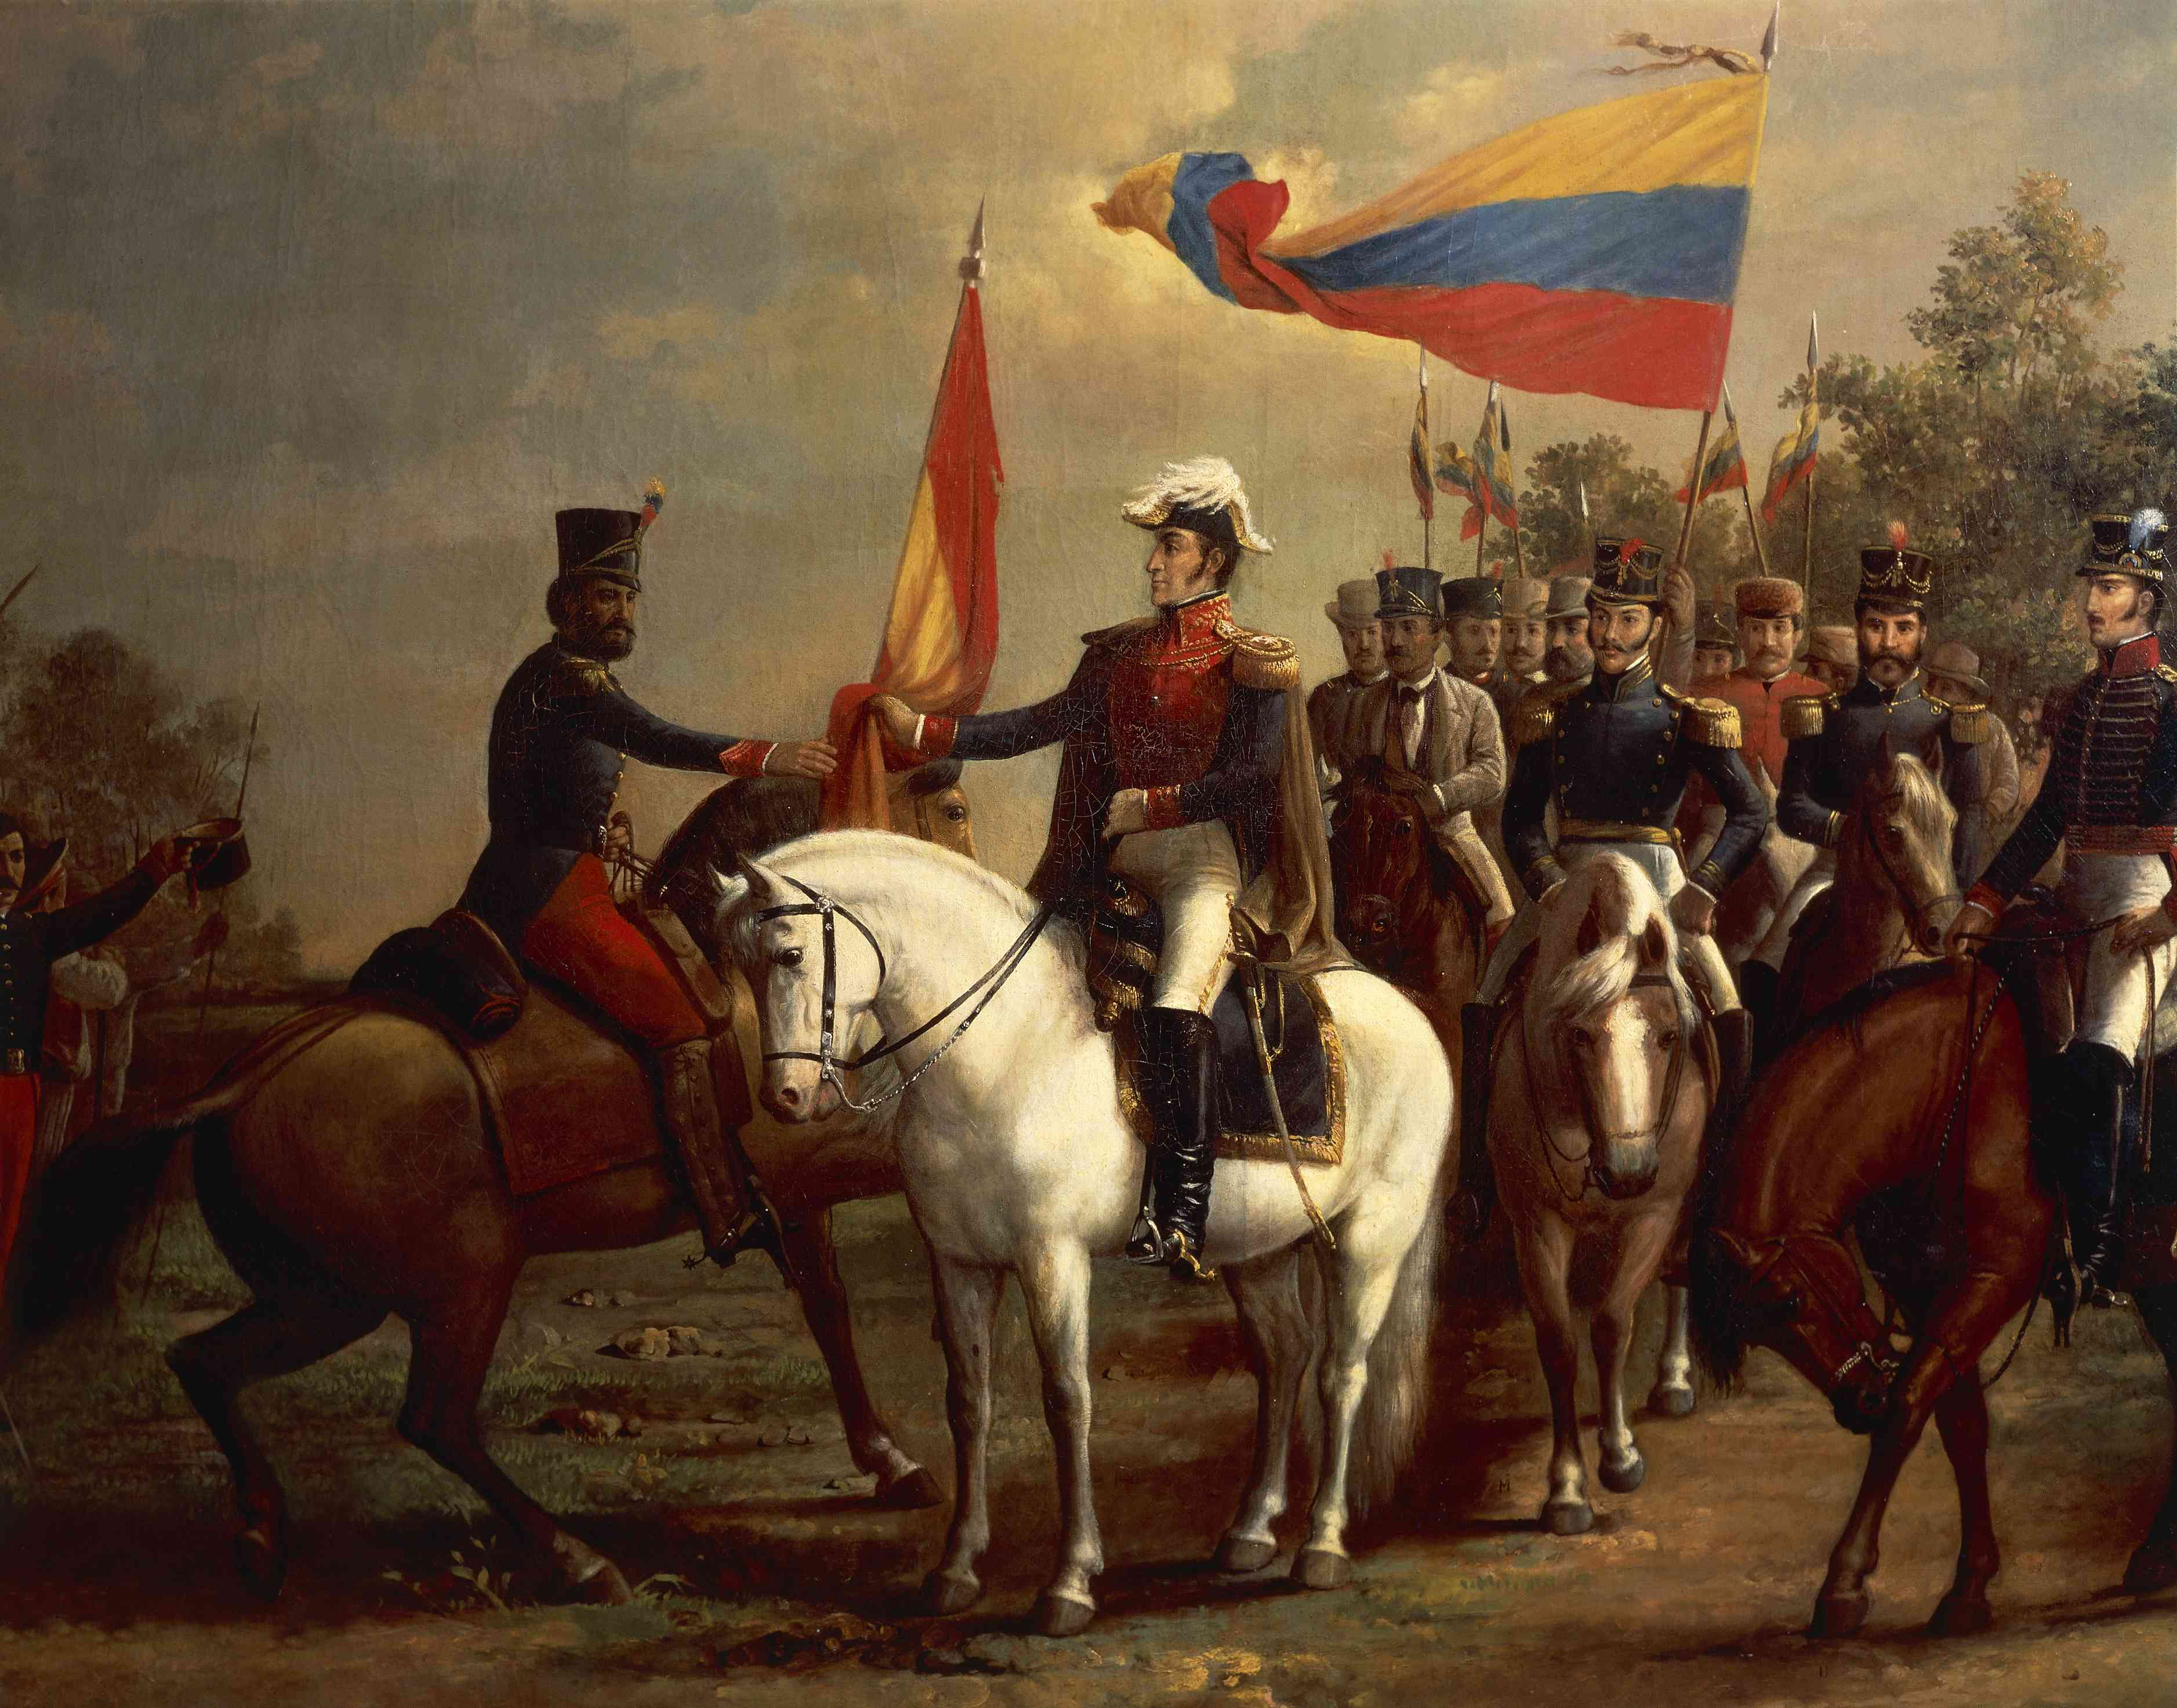 Simon Bolivar during Latin American wars of independence